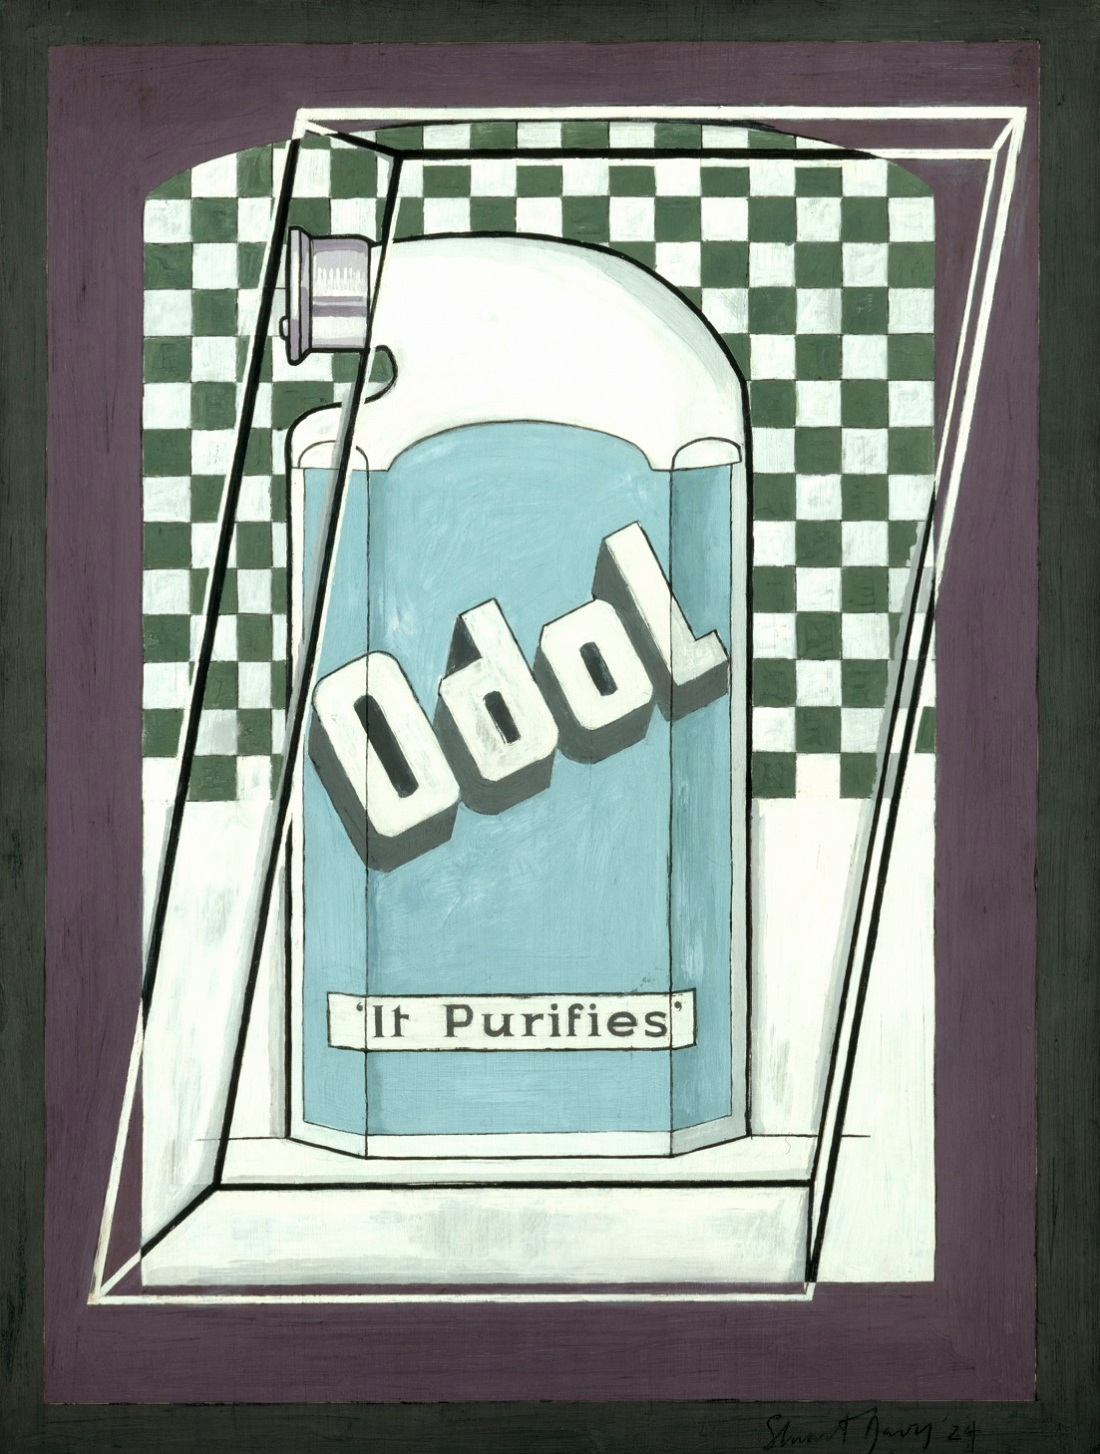 --Odol (c) The estate of Stuart Davis -DACS, London - VAGA, New York 2017